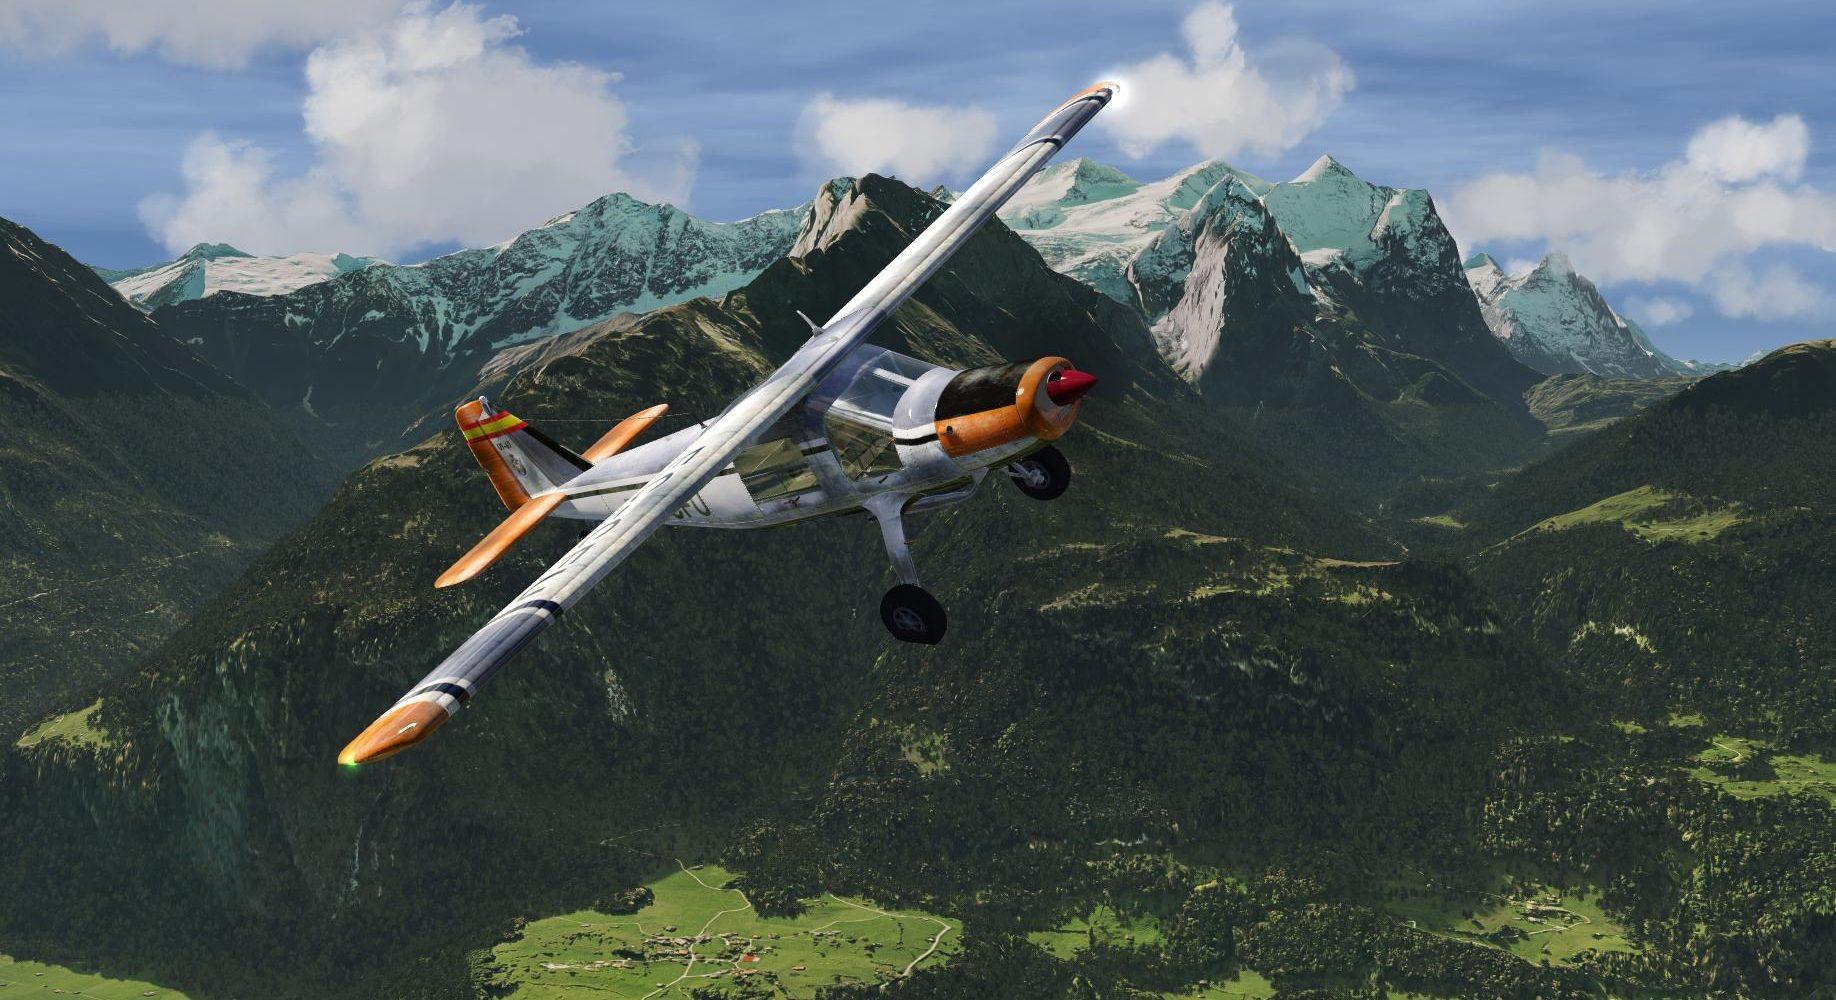 Aerofly-Sim de – Free Aerofly Add-Ons since 2010